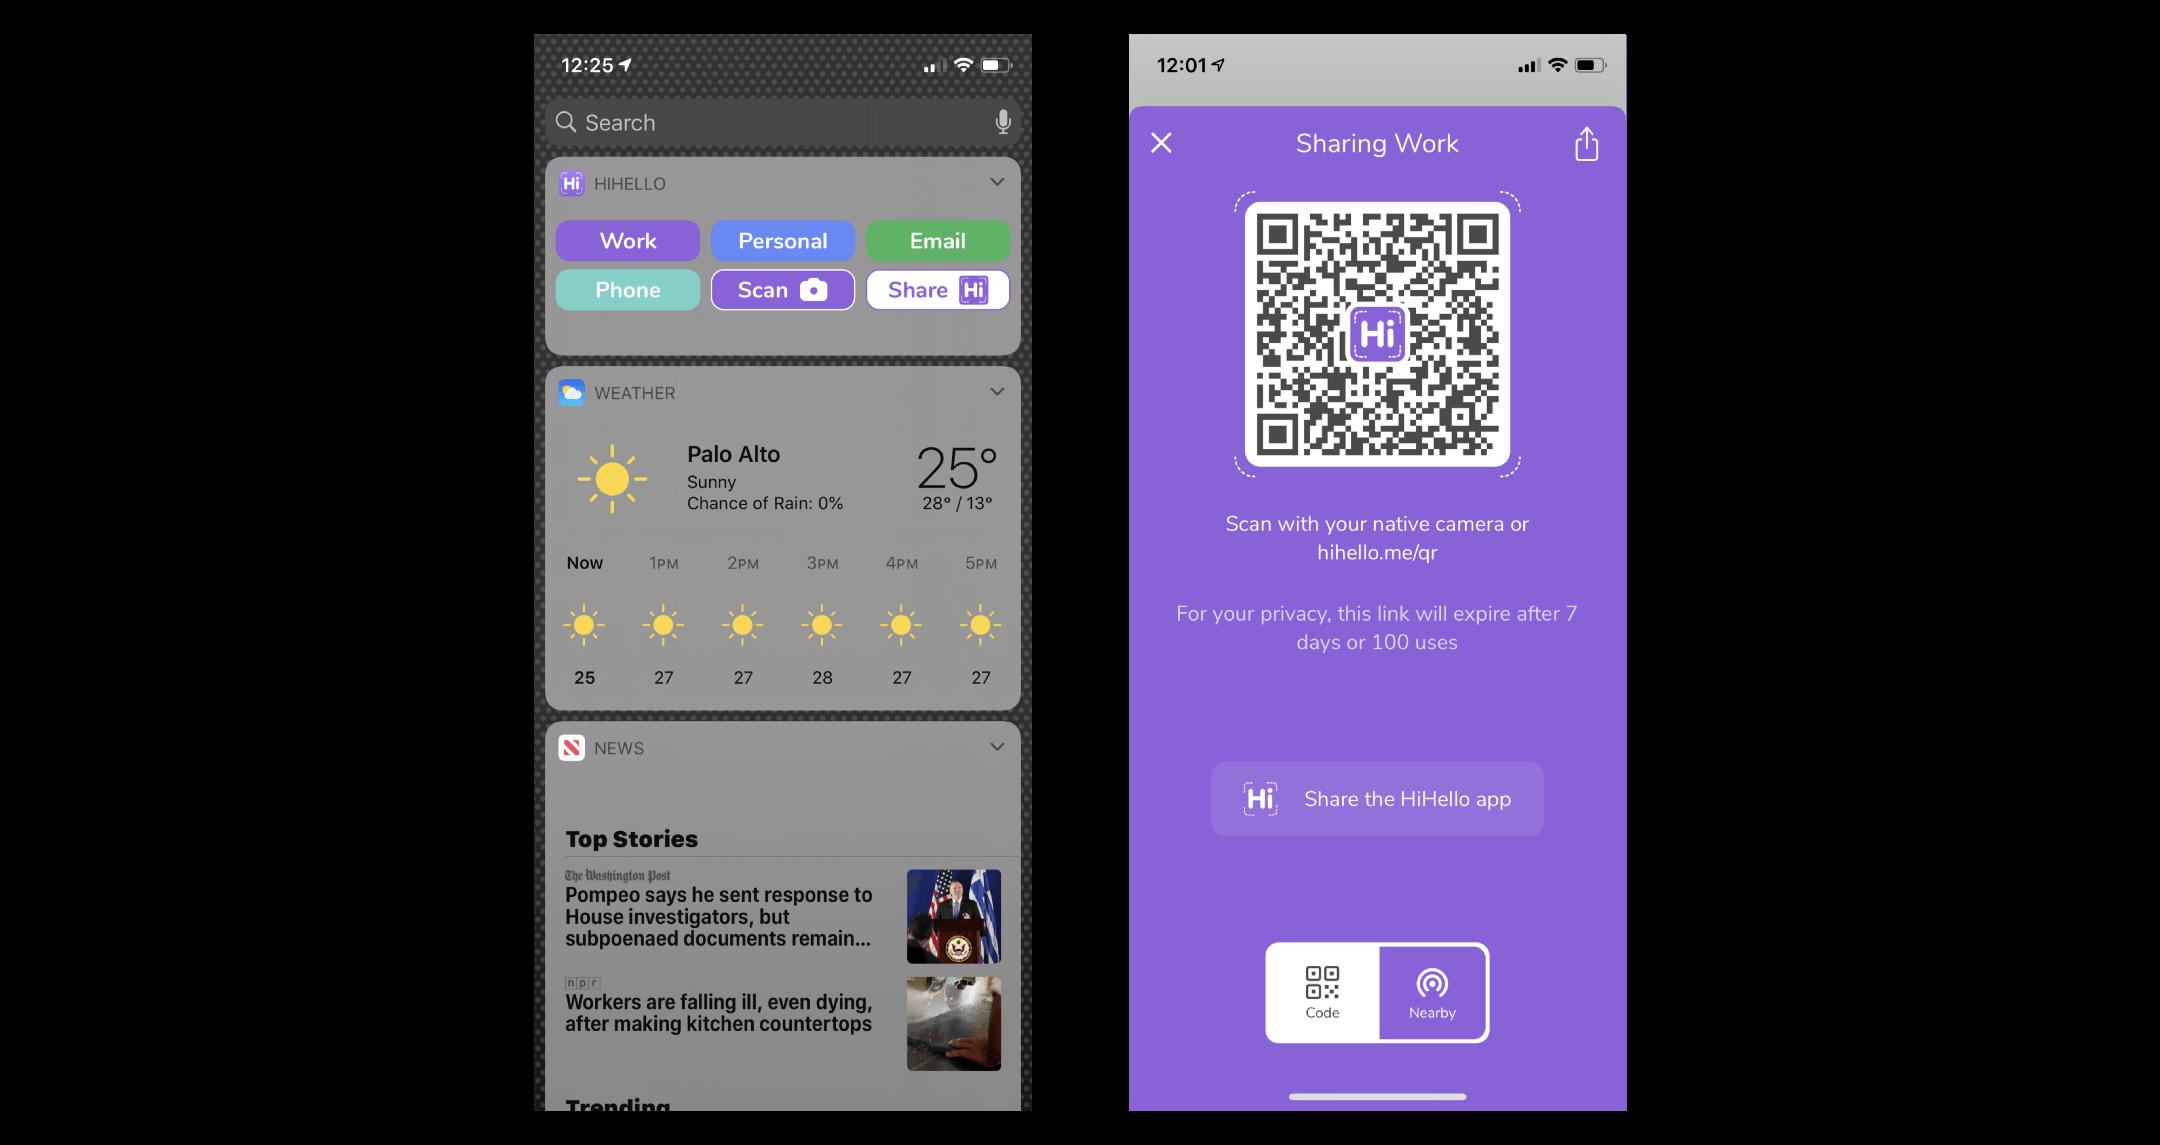 HiHello widget and QR code